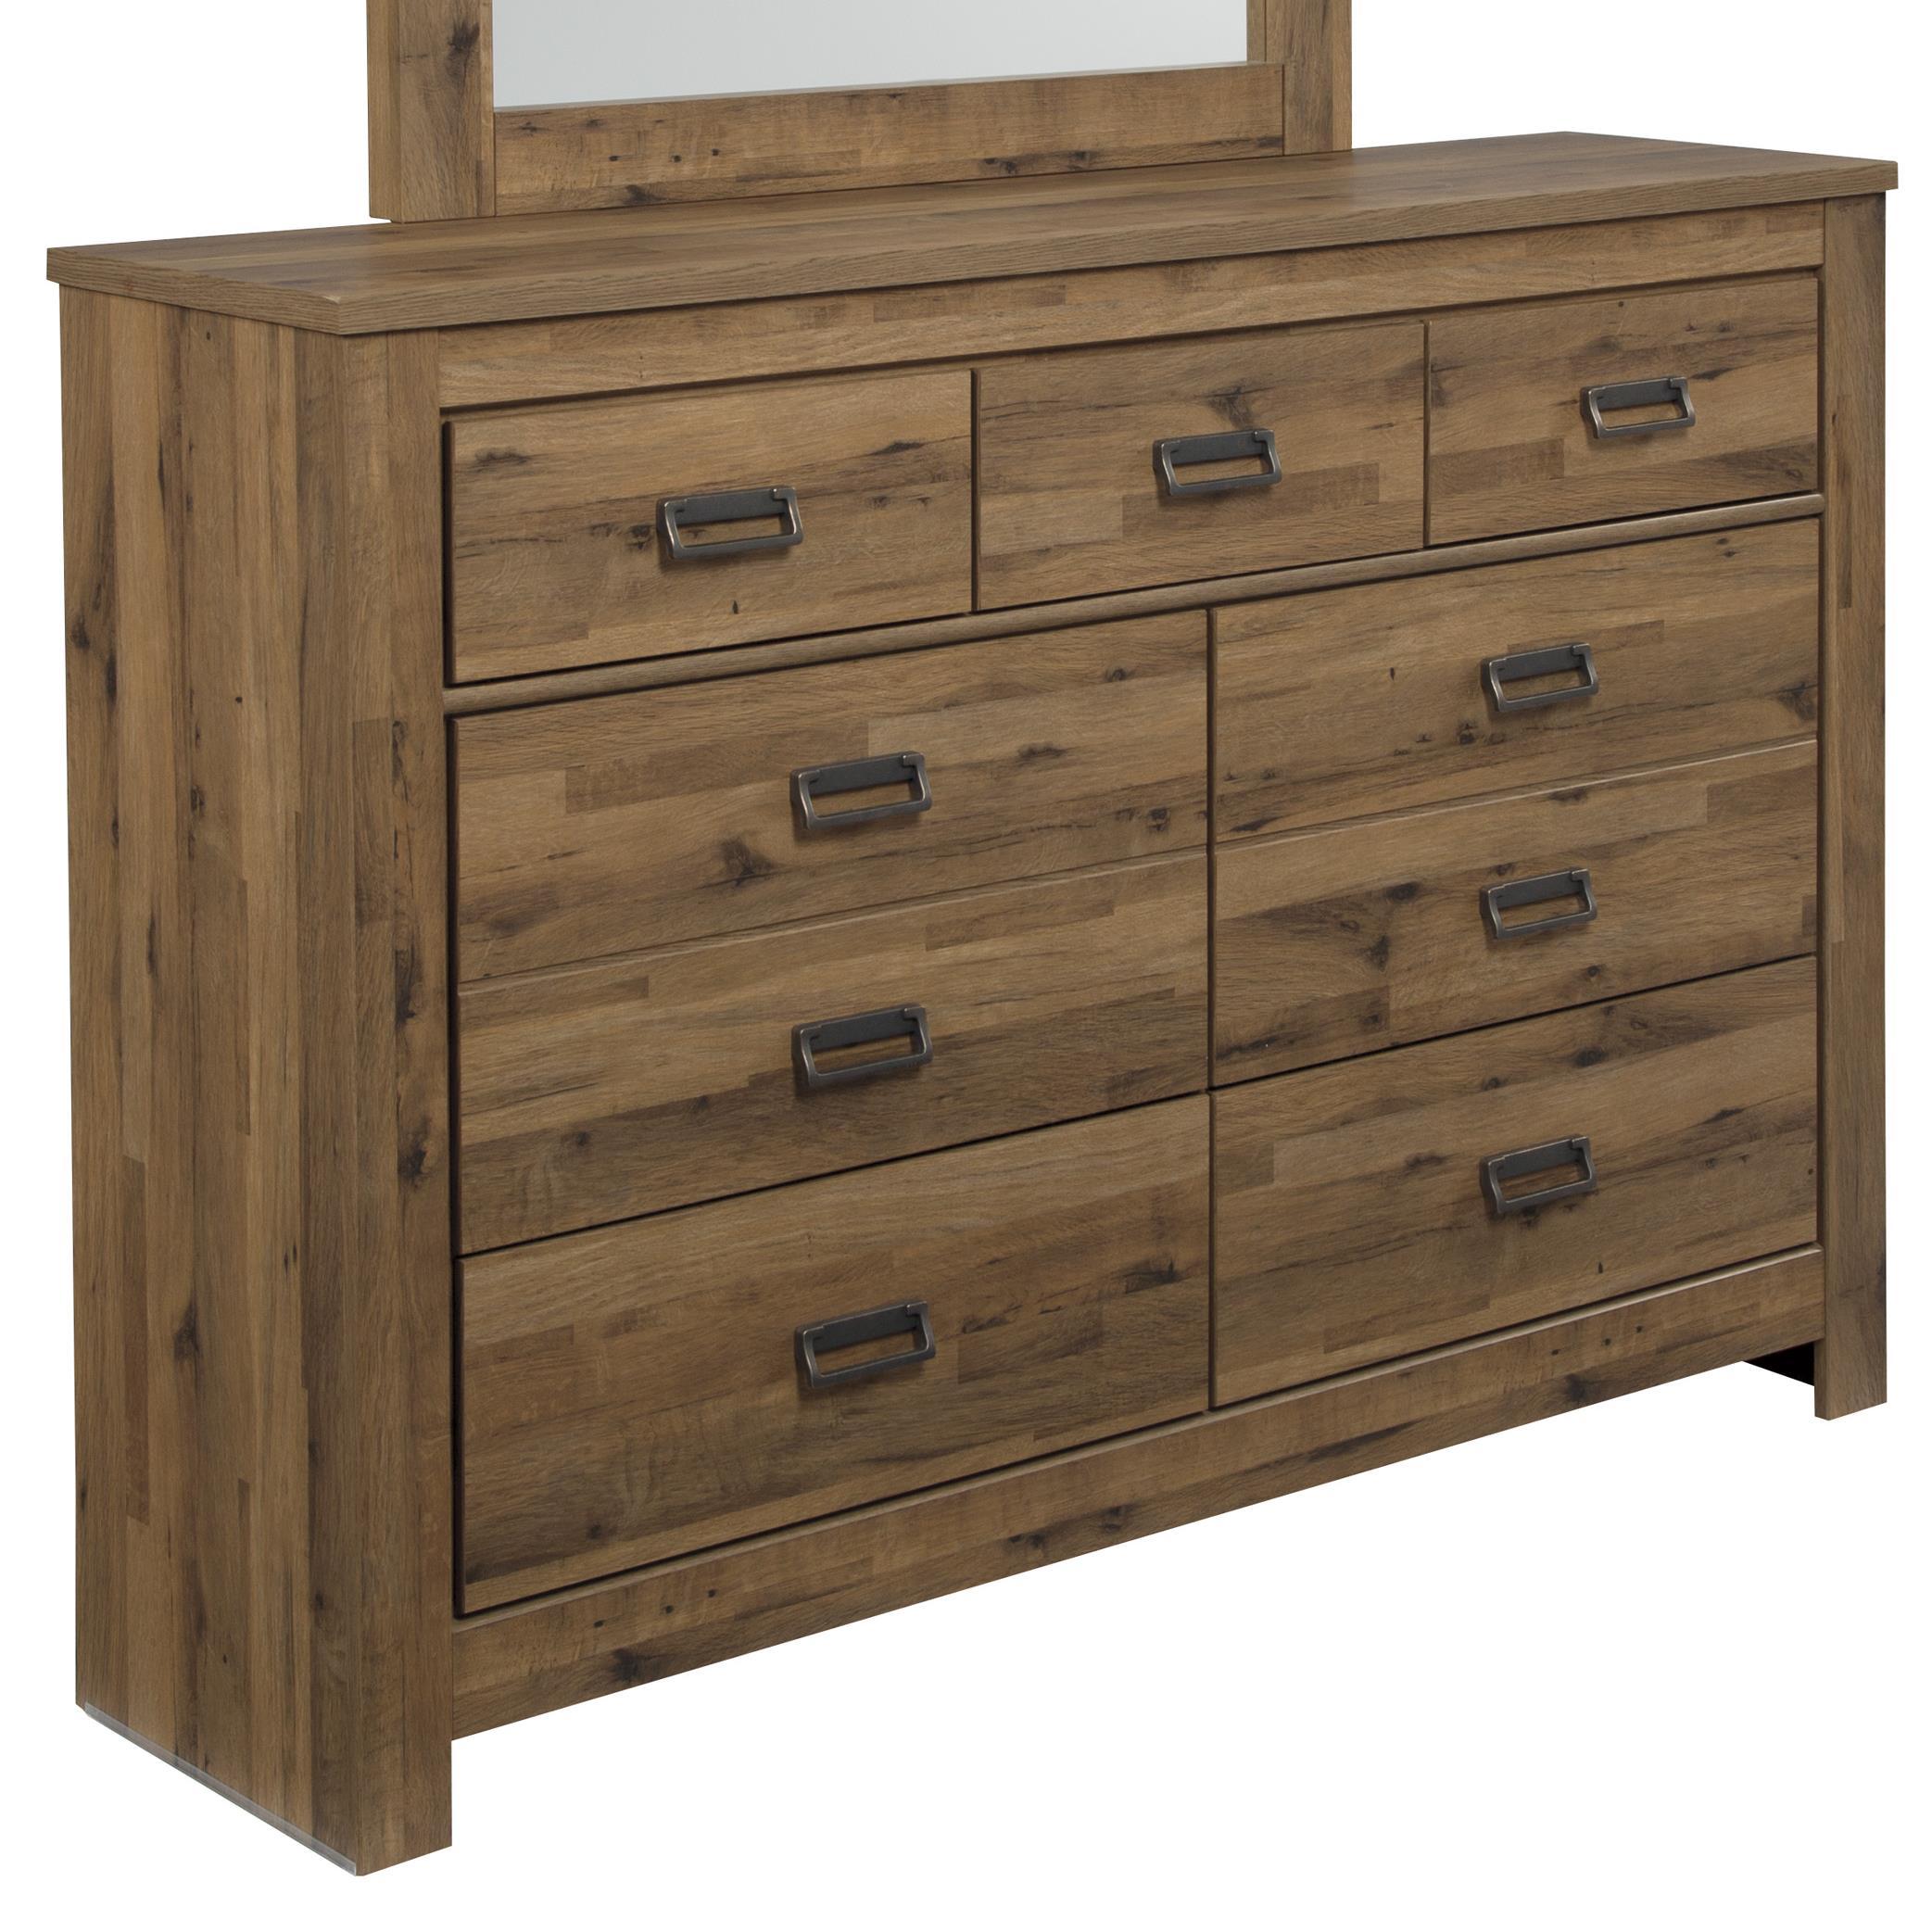 Signature Design by Ashley Cinrey Dresser - Item Number: B369-31